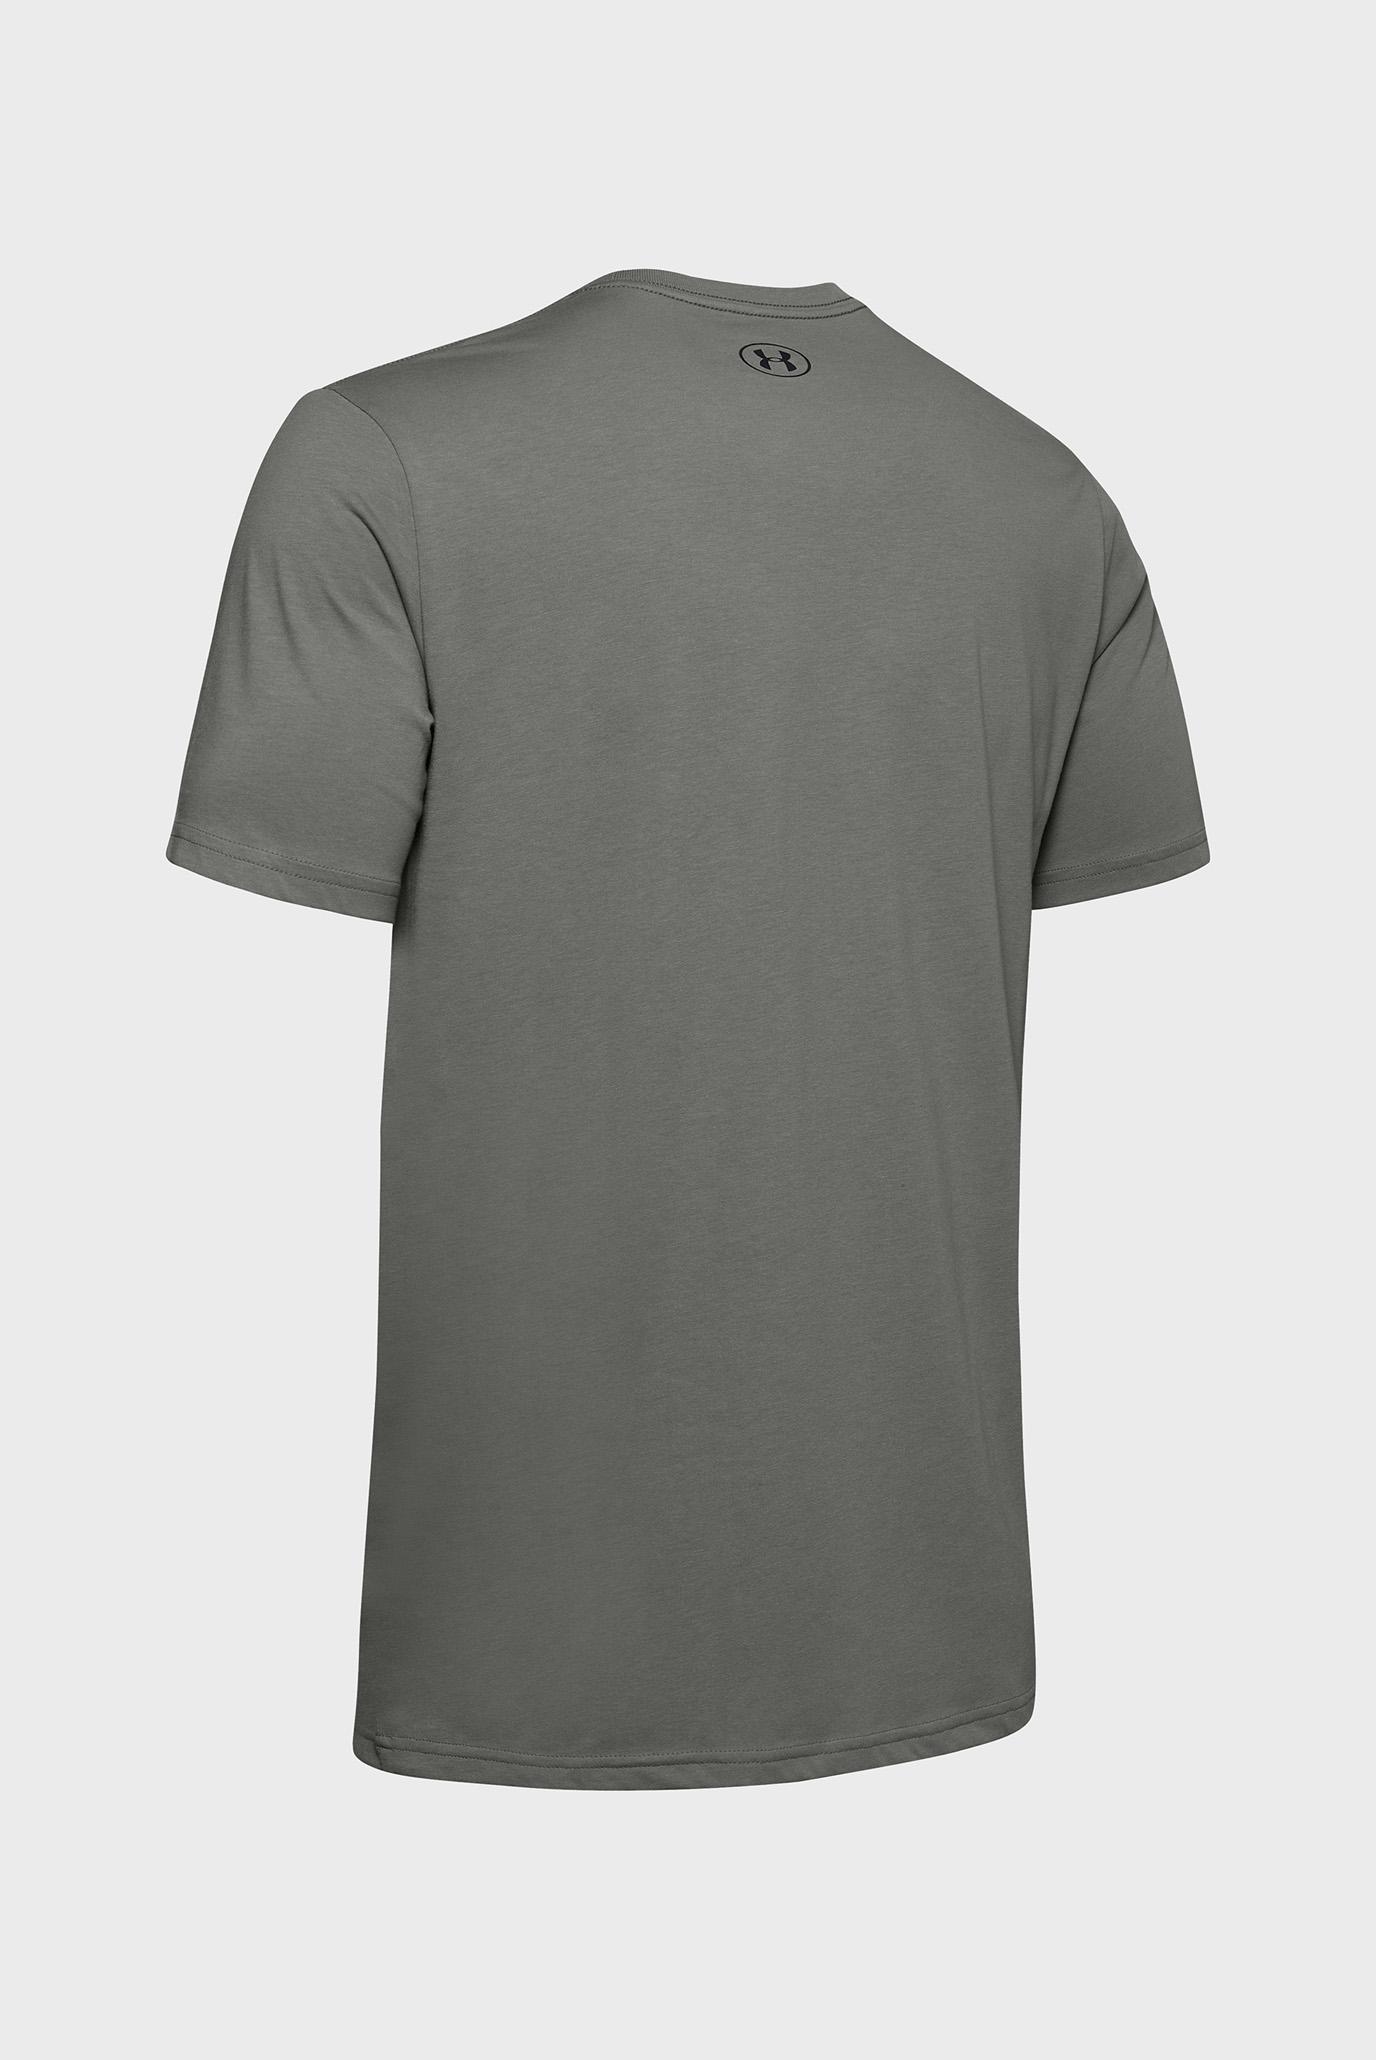 Мужская оливковая футболка UA GL Foundation SS T Under Armour